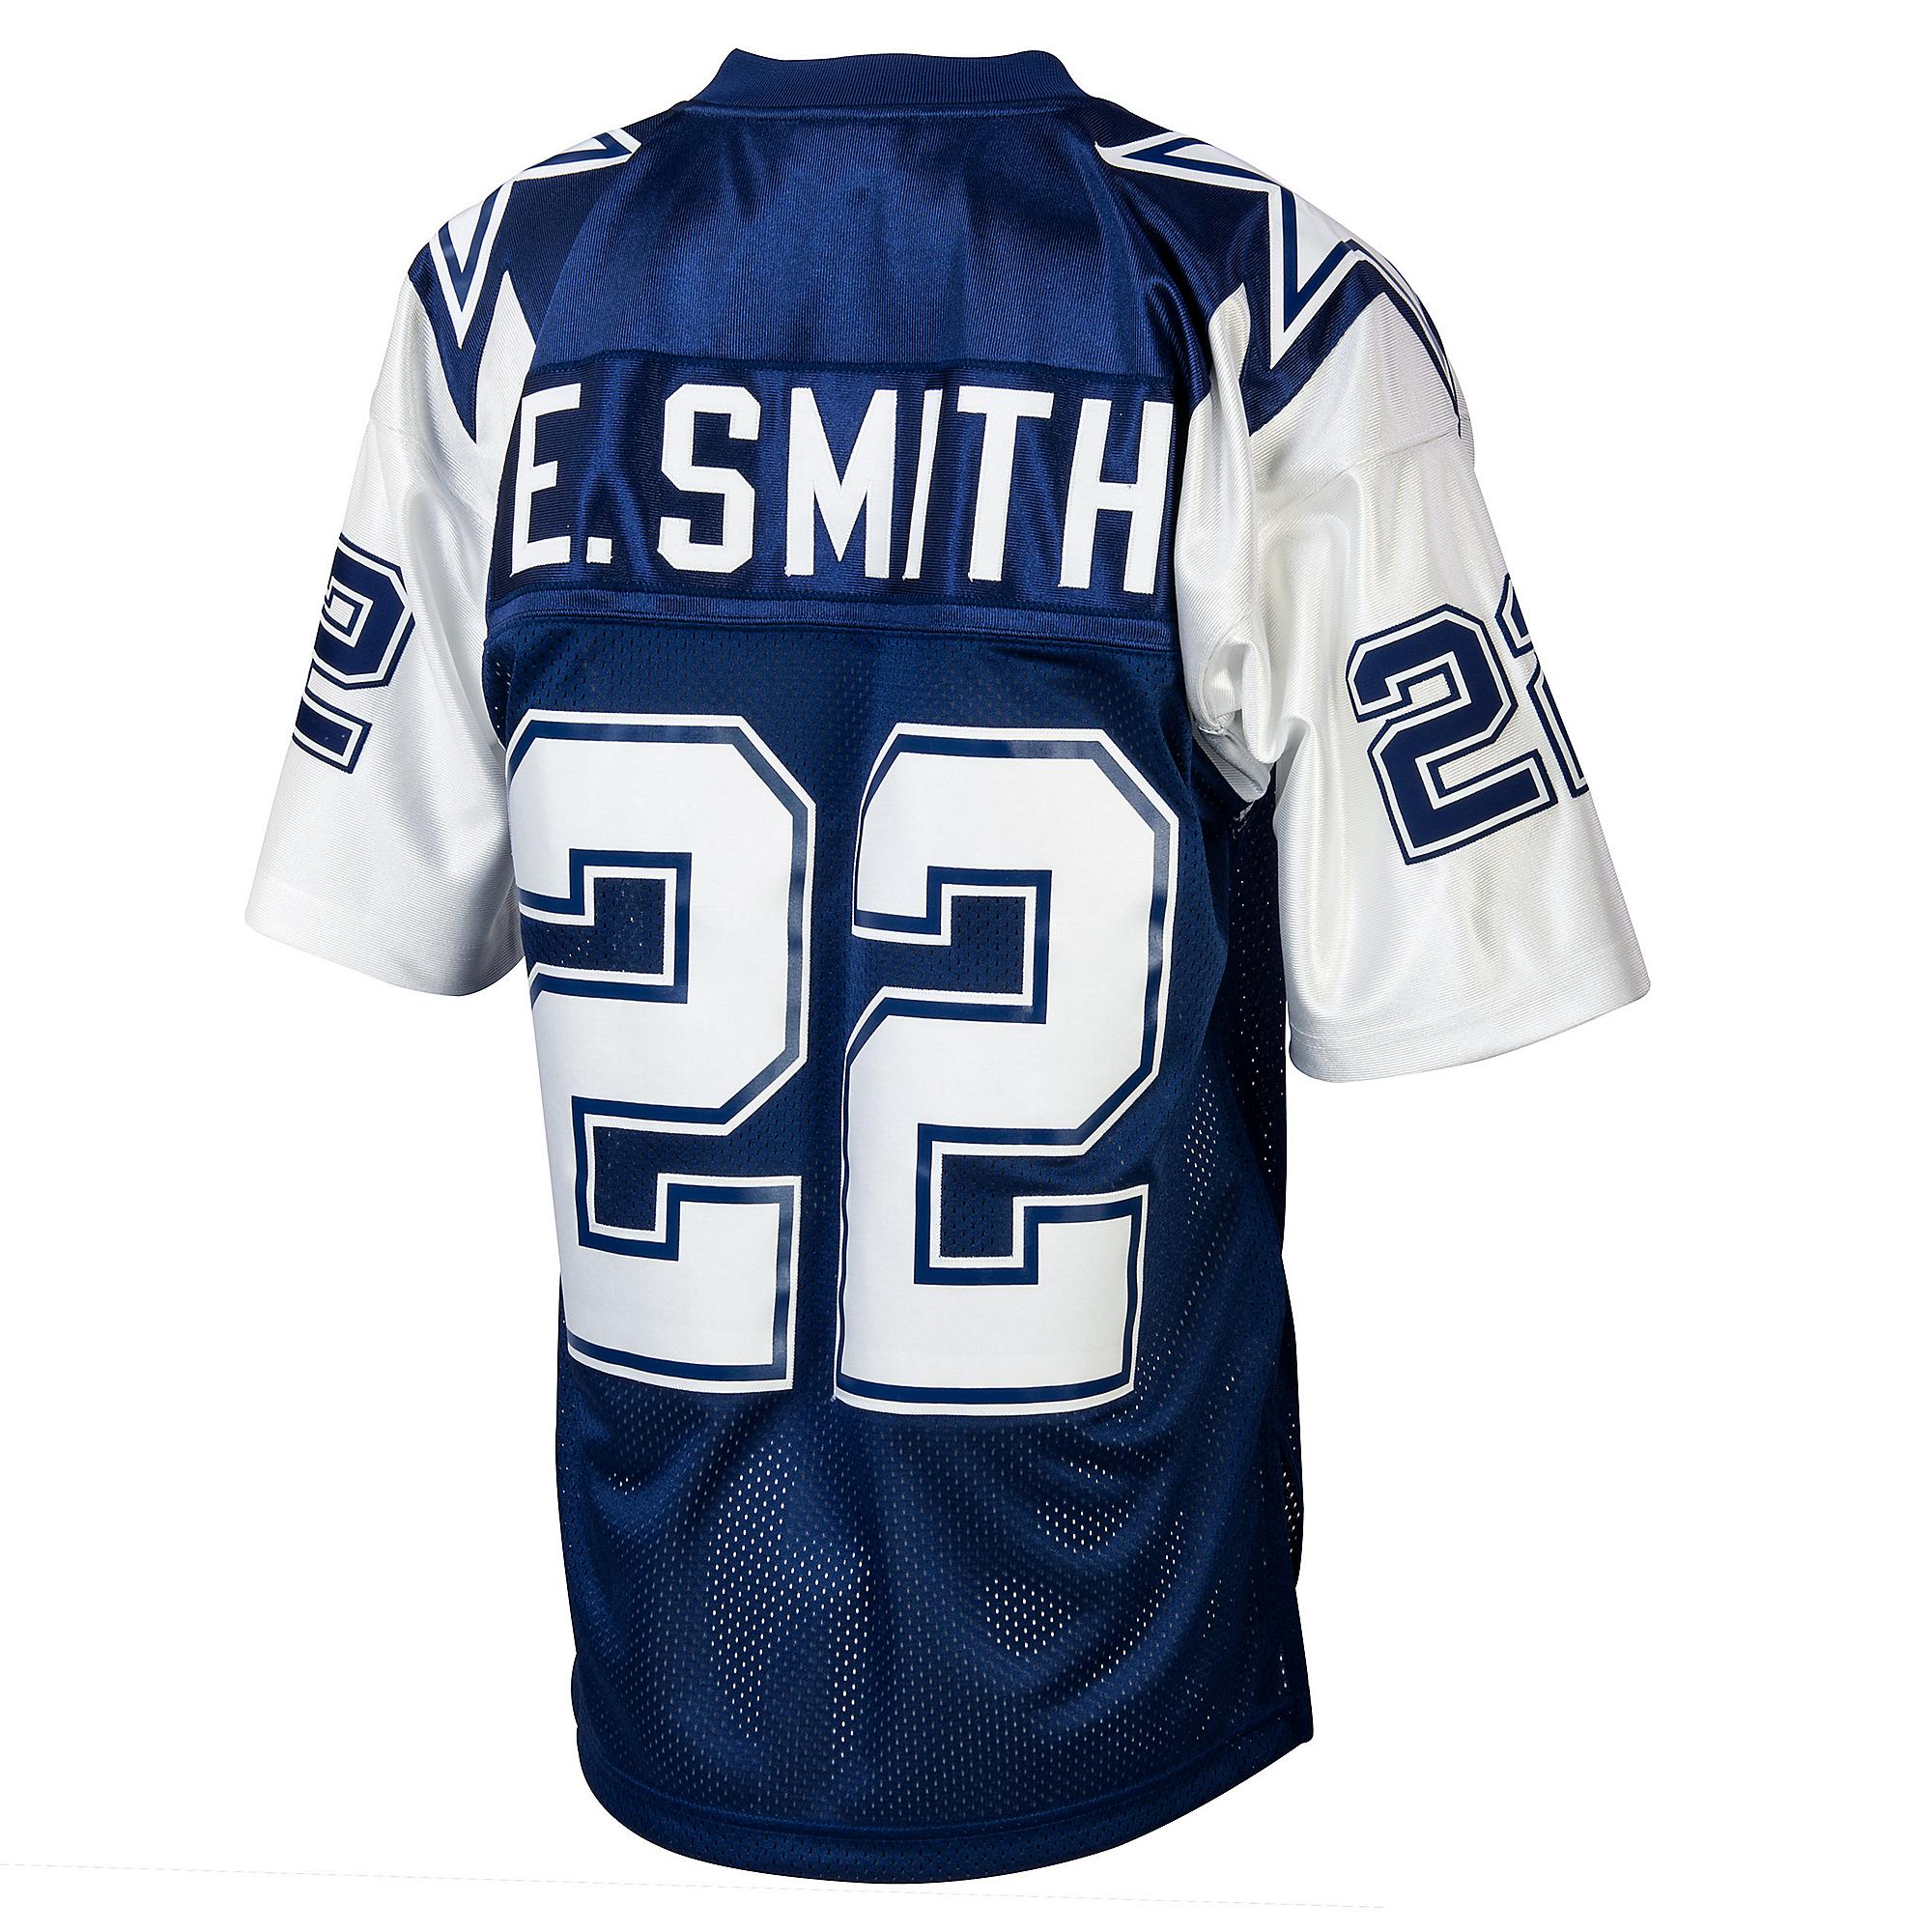 9923b43eea8 Dallas Cowboys Emmitt Smith 1995 Mitchell & Ness Double Star Jersey ...